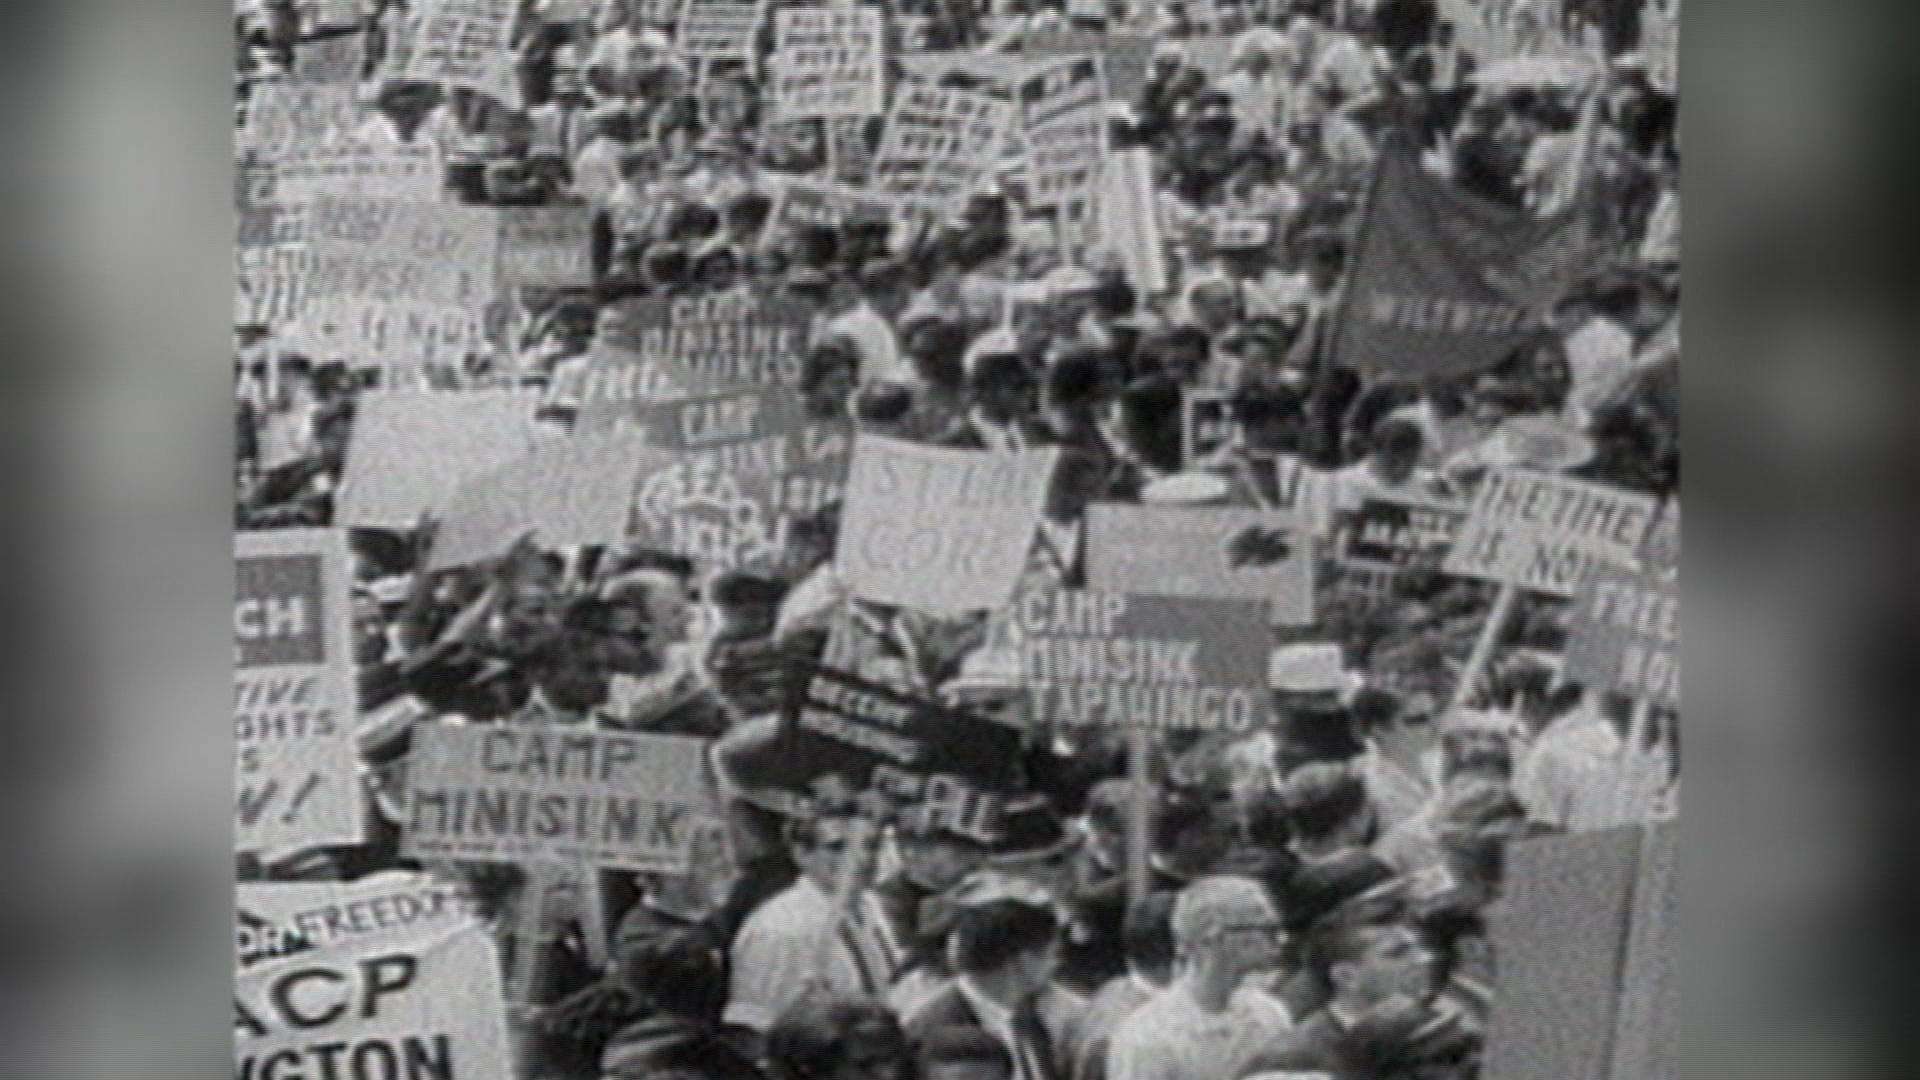 Dr. MLK Jr.'s fight against poverty